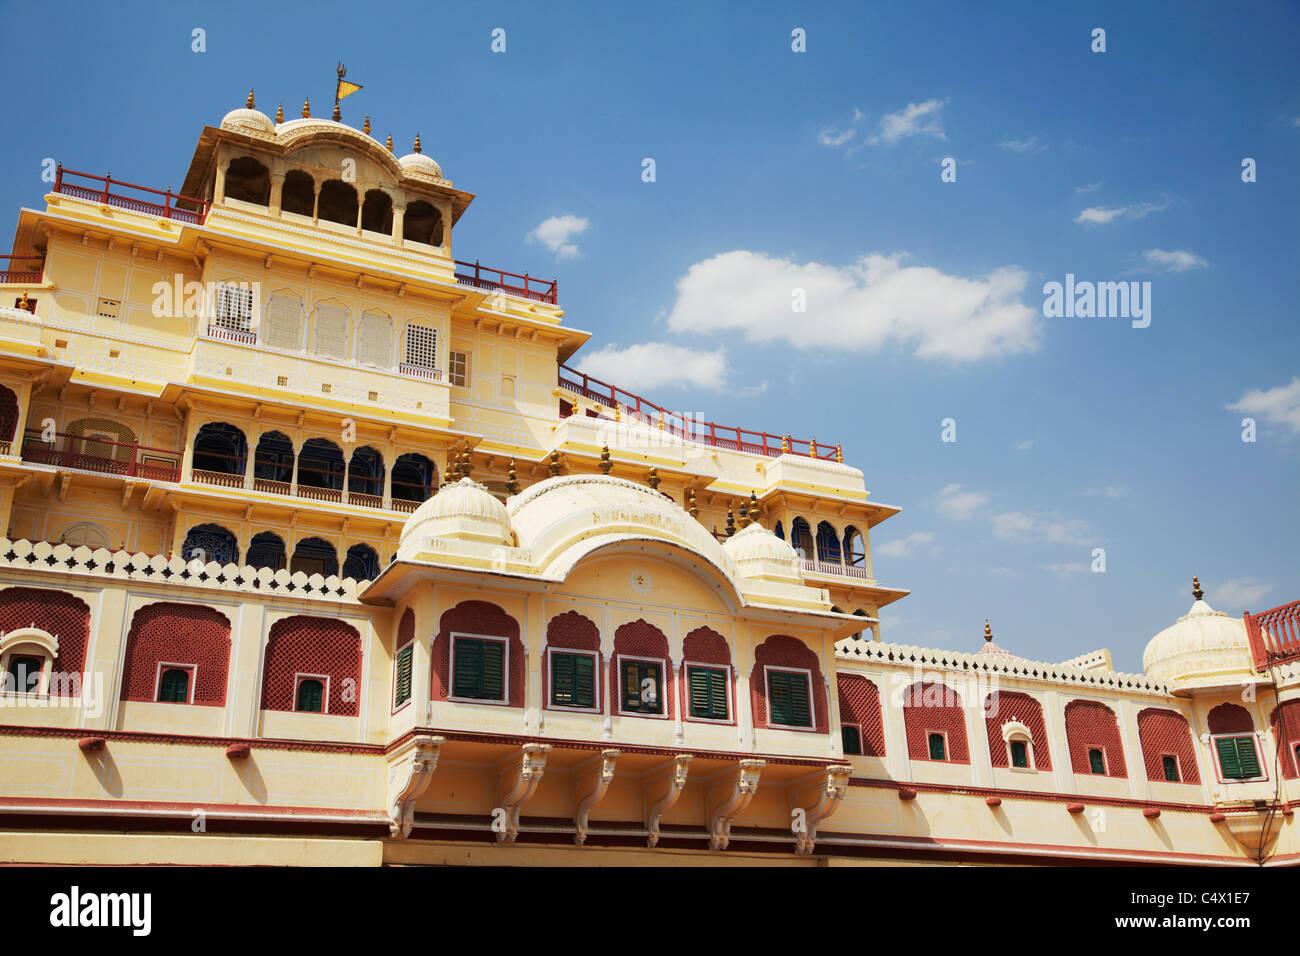 Chandra Mahal, City Palace, Jaipur, Rajasthan, India Stock Photo